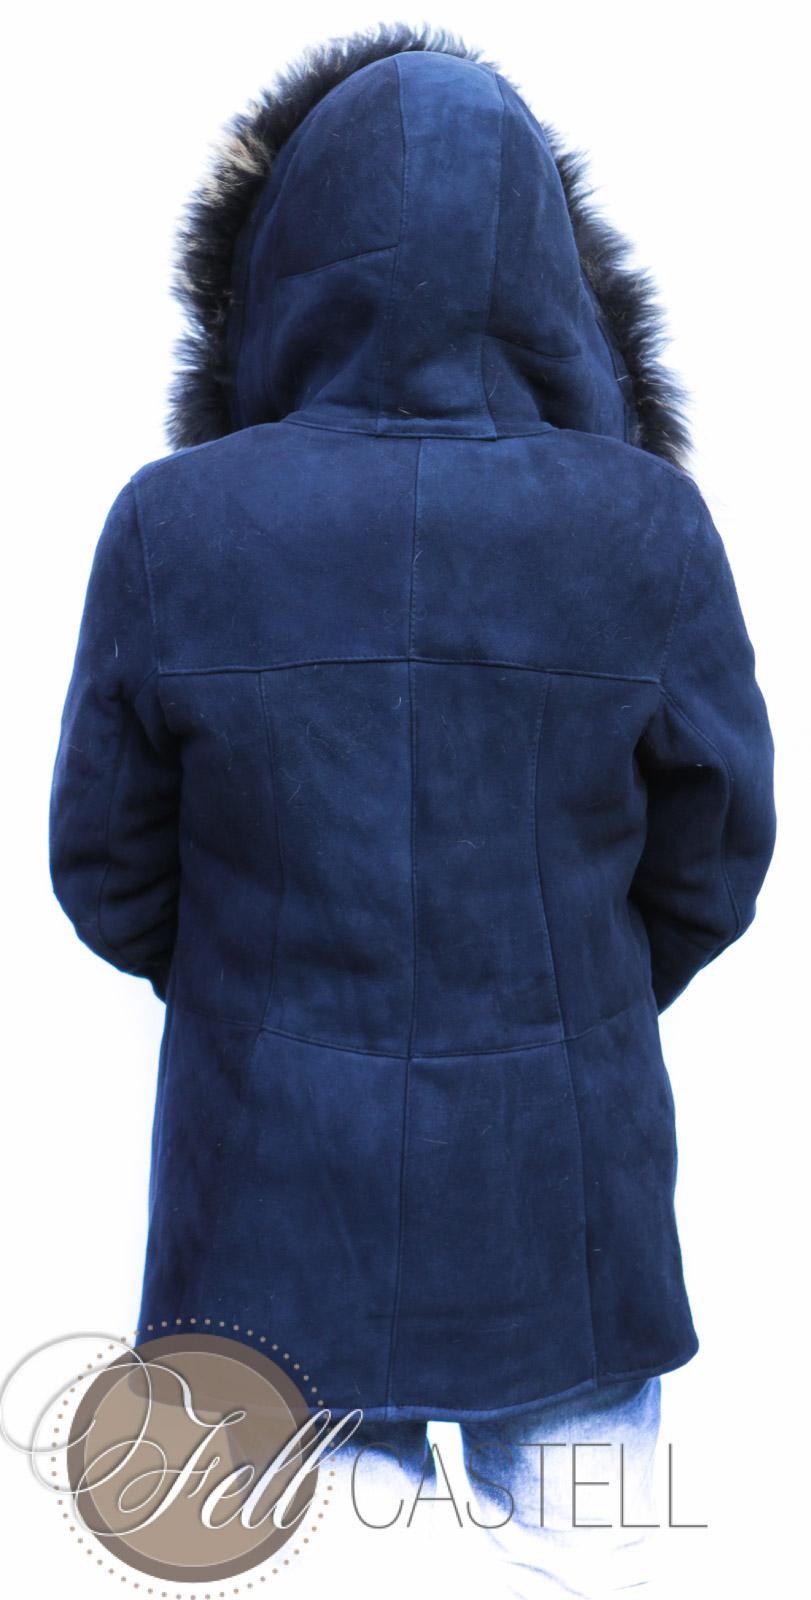 Lammfelljacke Damen Velourleder dunkelblau Lammfell Jacke mit Kapuze Gr. 38 blau | Gr. 38